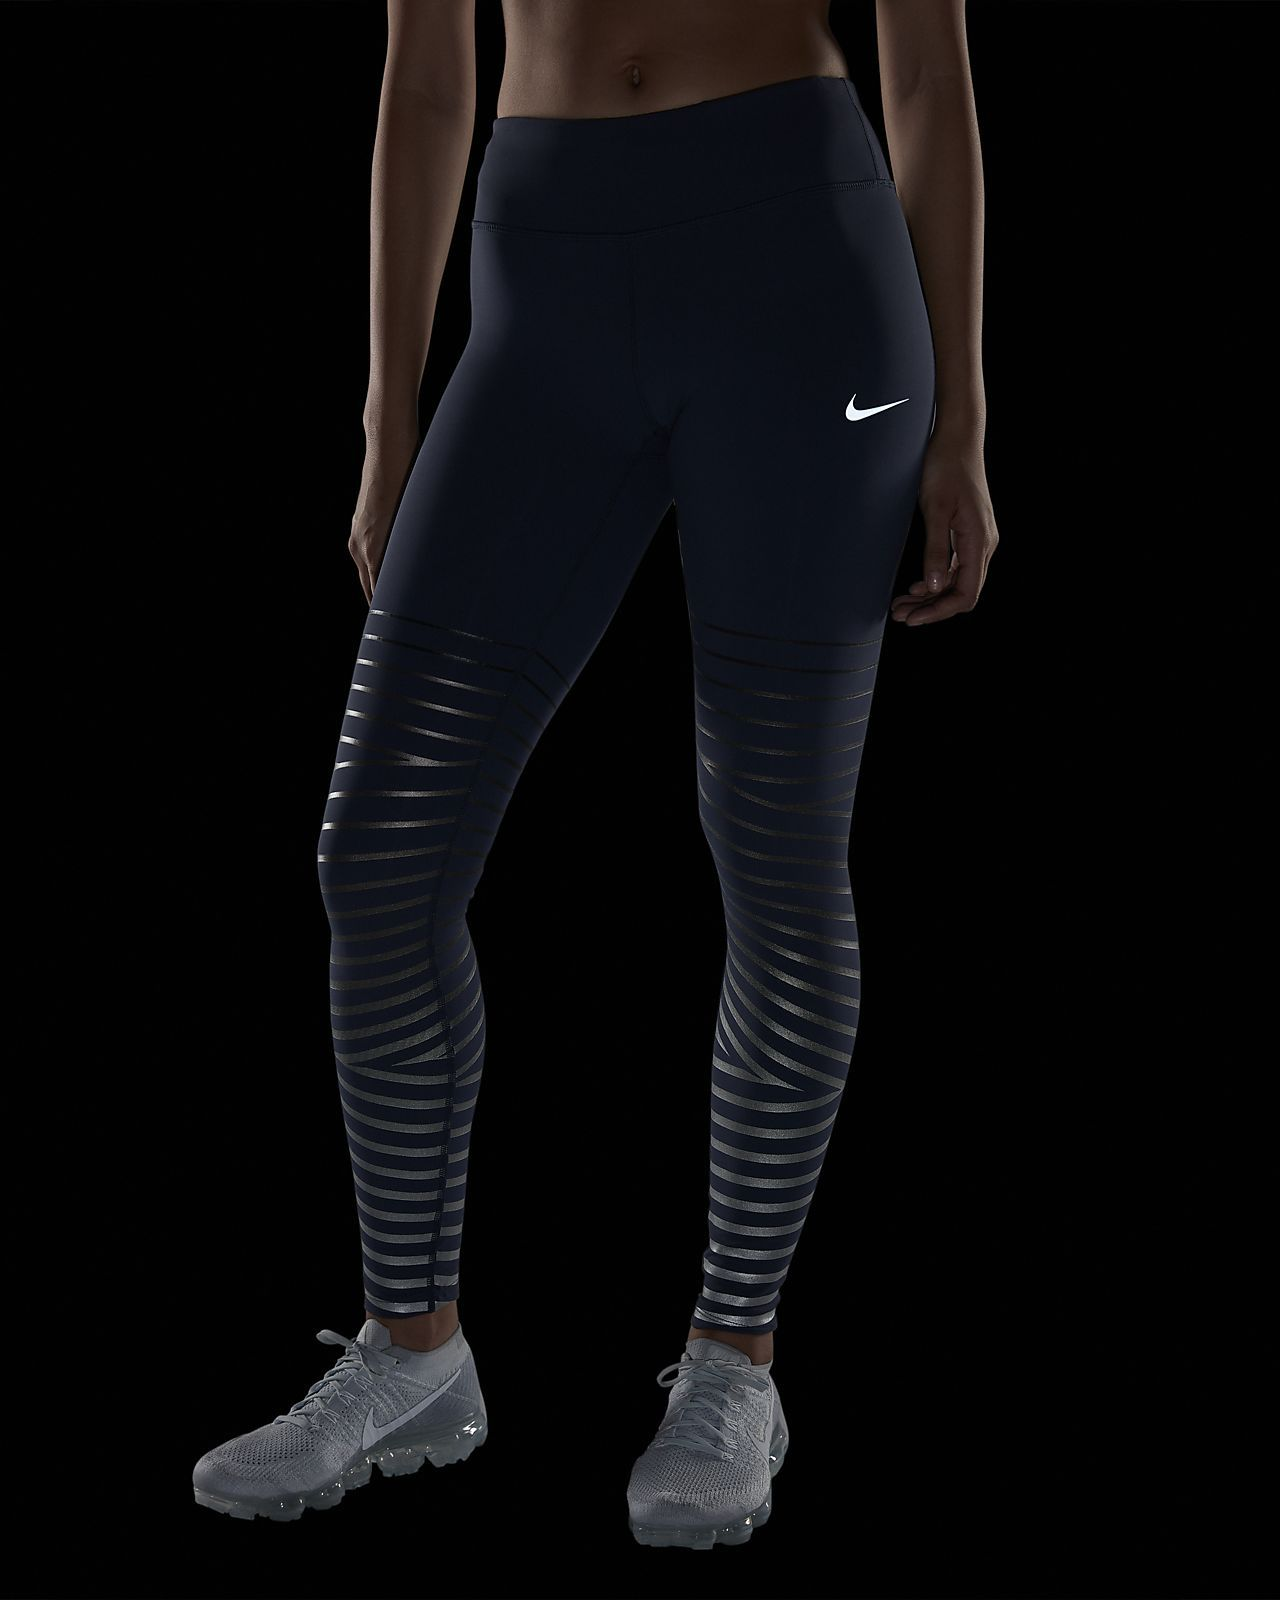 97e9931aa8cd Small gray or black Nike Epic Lux Flash Women s 27.5